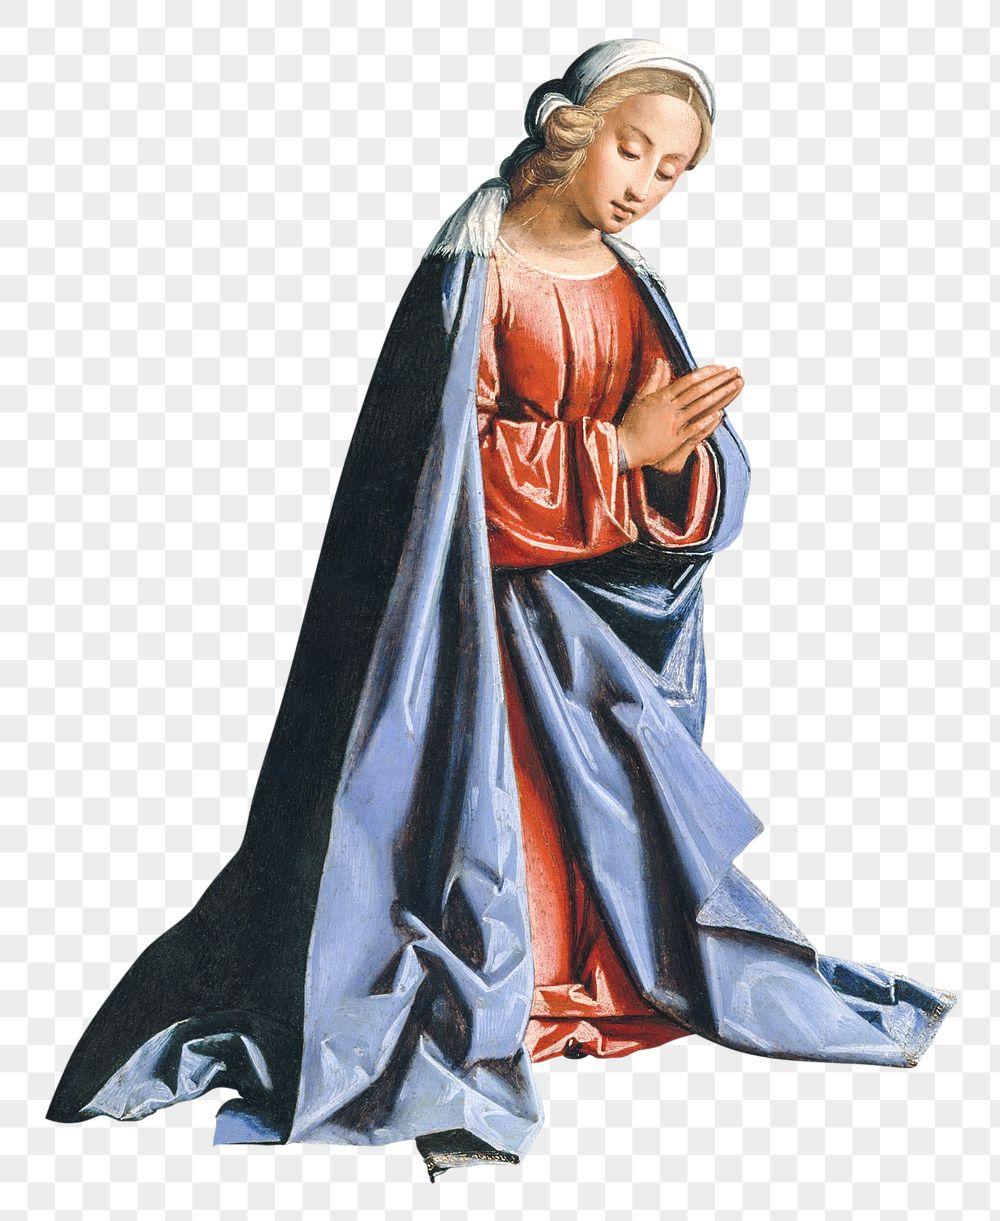 A woman kneeling and praying transparent png